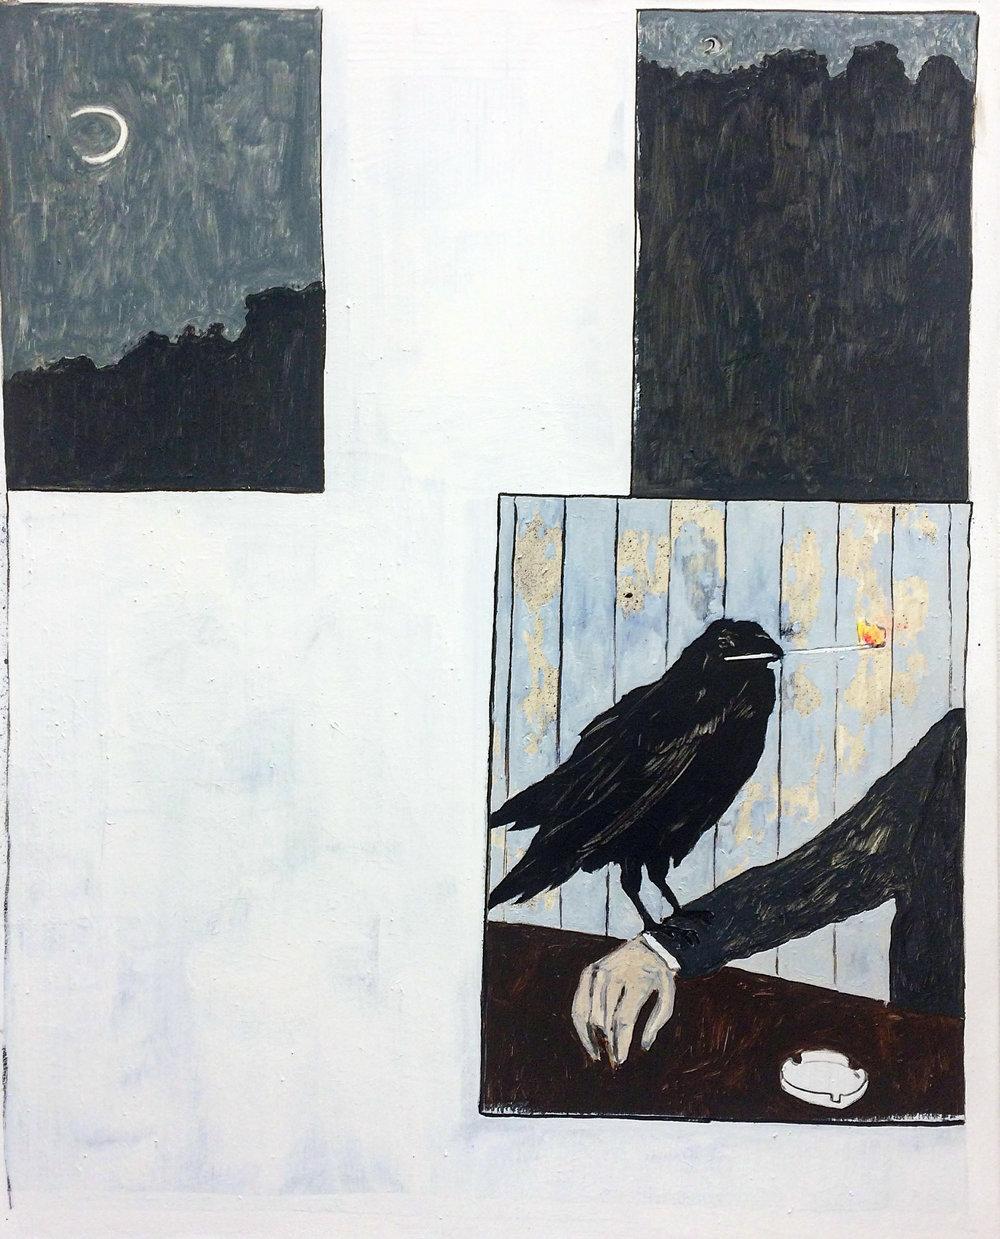 Raven_Oil on canvas_150x120 cm.jpg